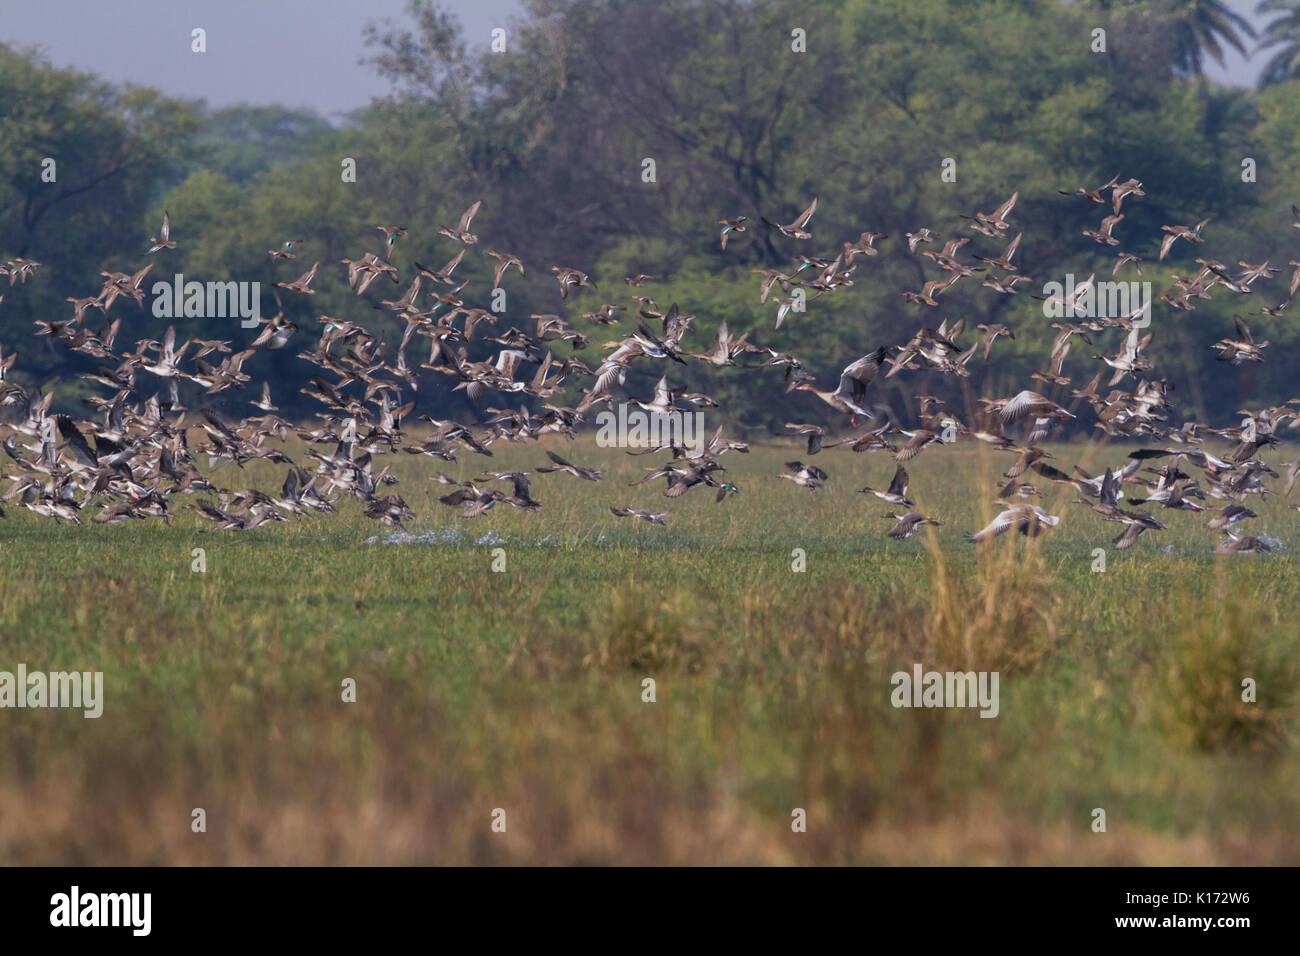 Flock of migratory Birds at Bharatpur Bird Sanctuary in Rajasthan, India. - Stock Image